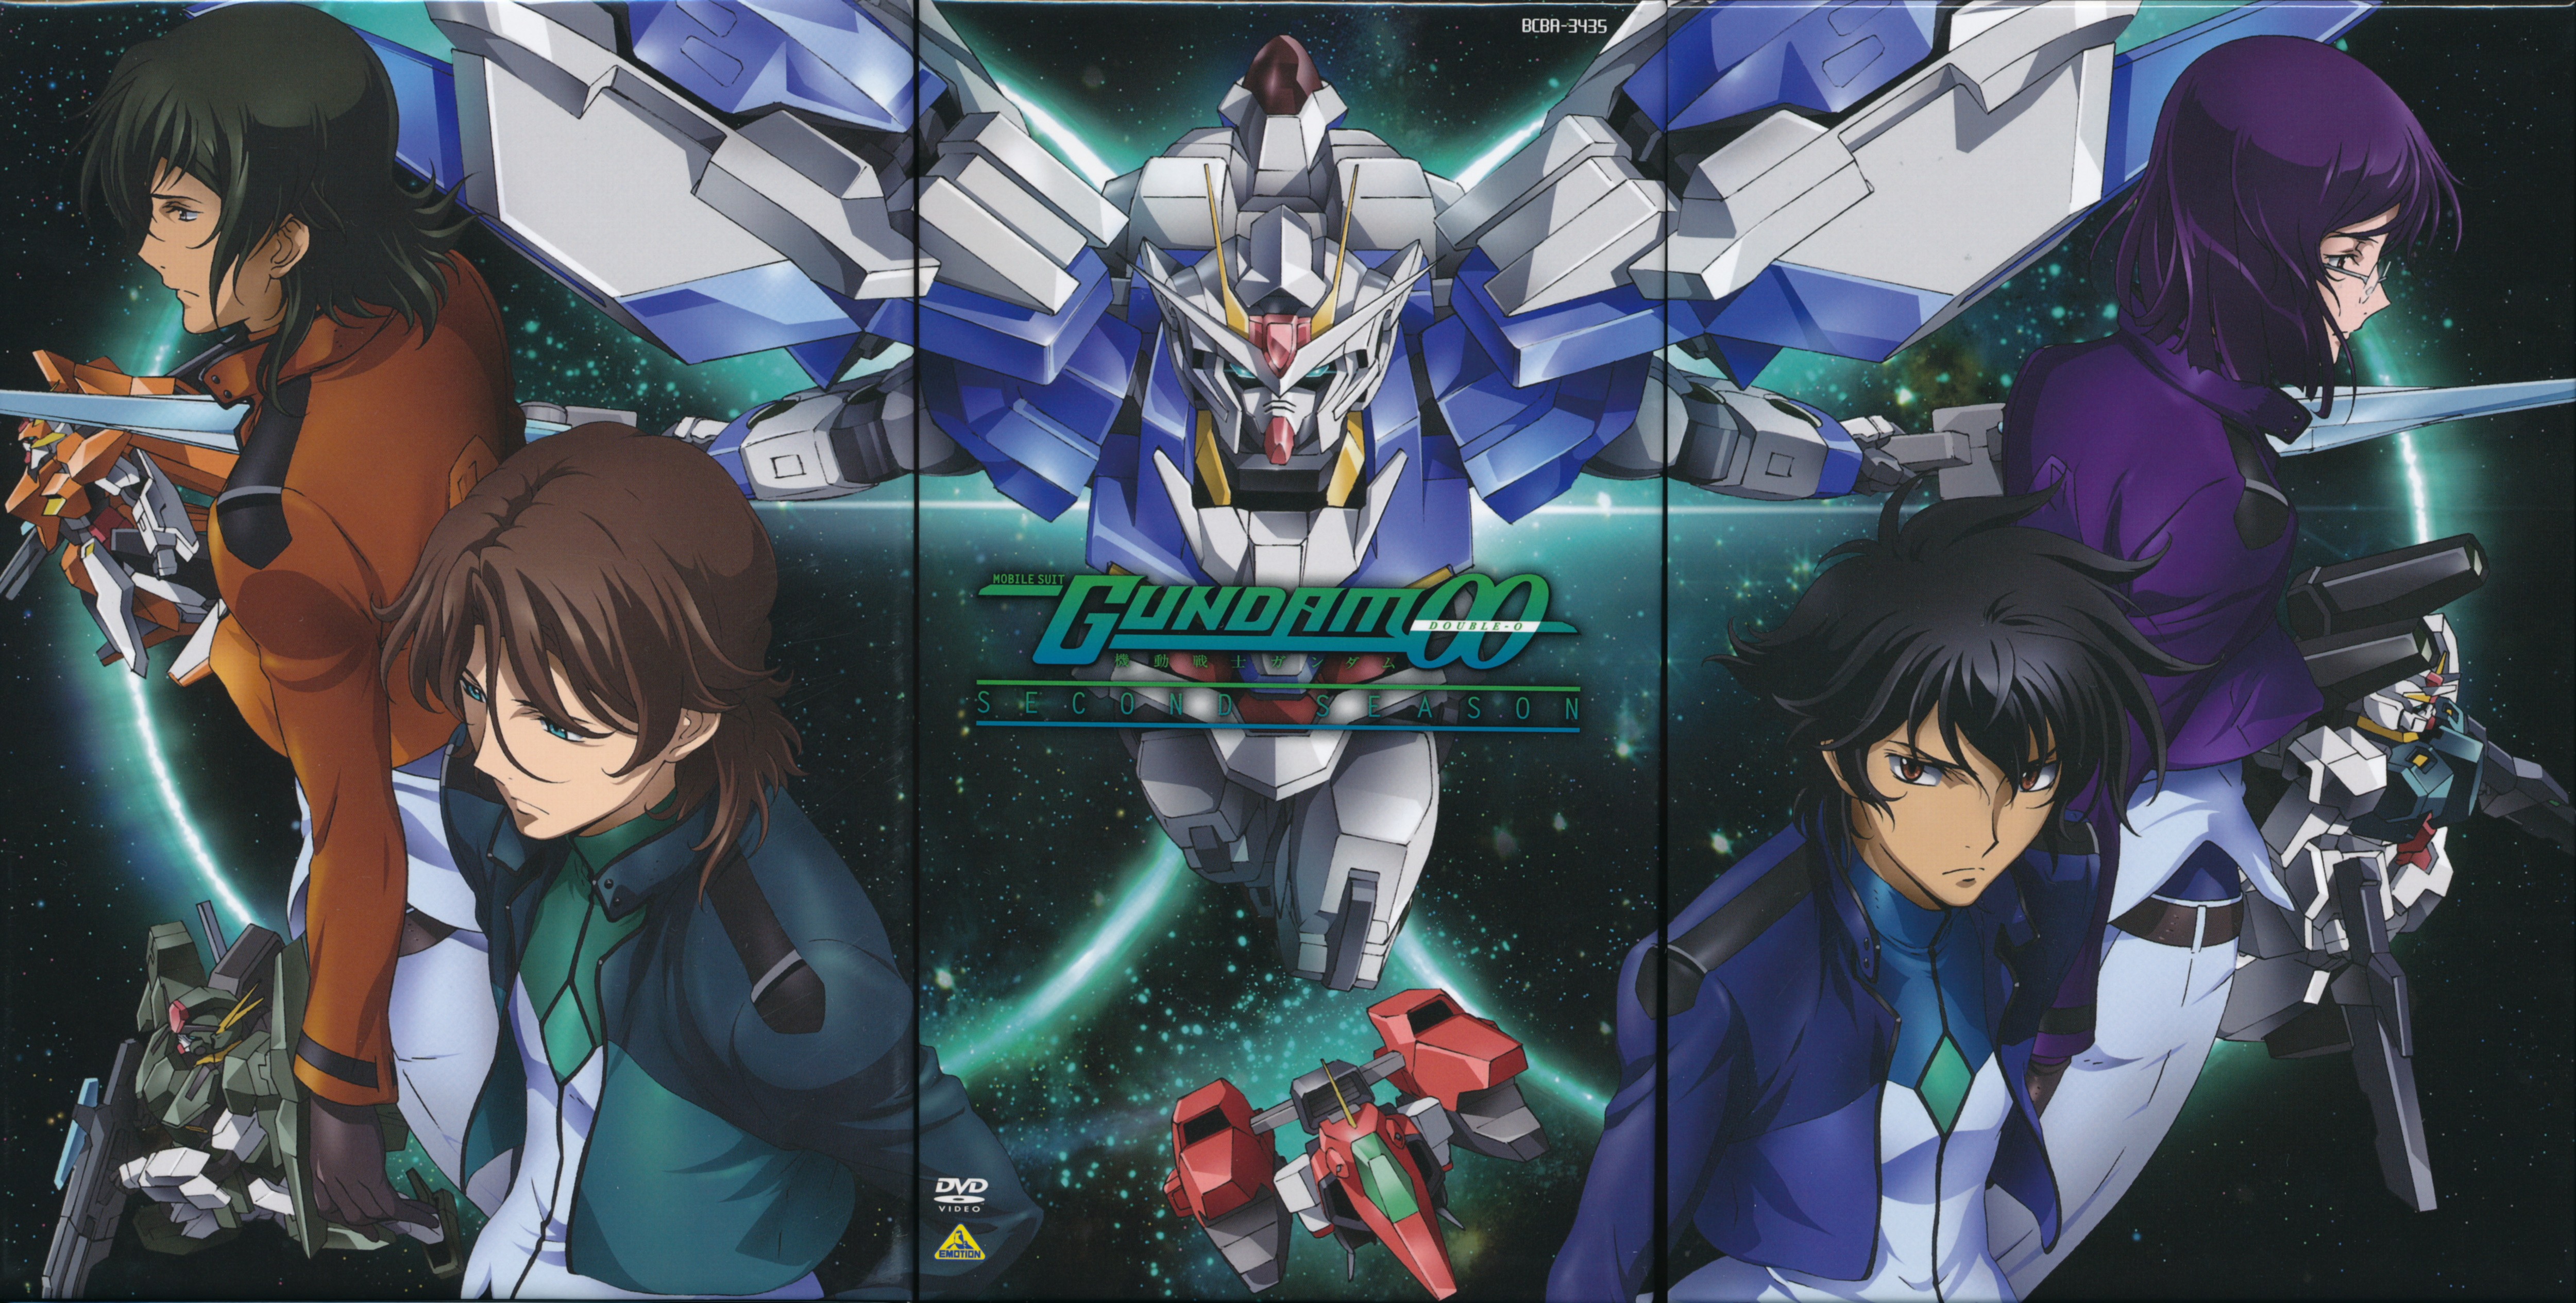 Mobile Suit Gundam 00 Wallpaper 116901 Zerochan Anime Image Board